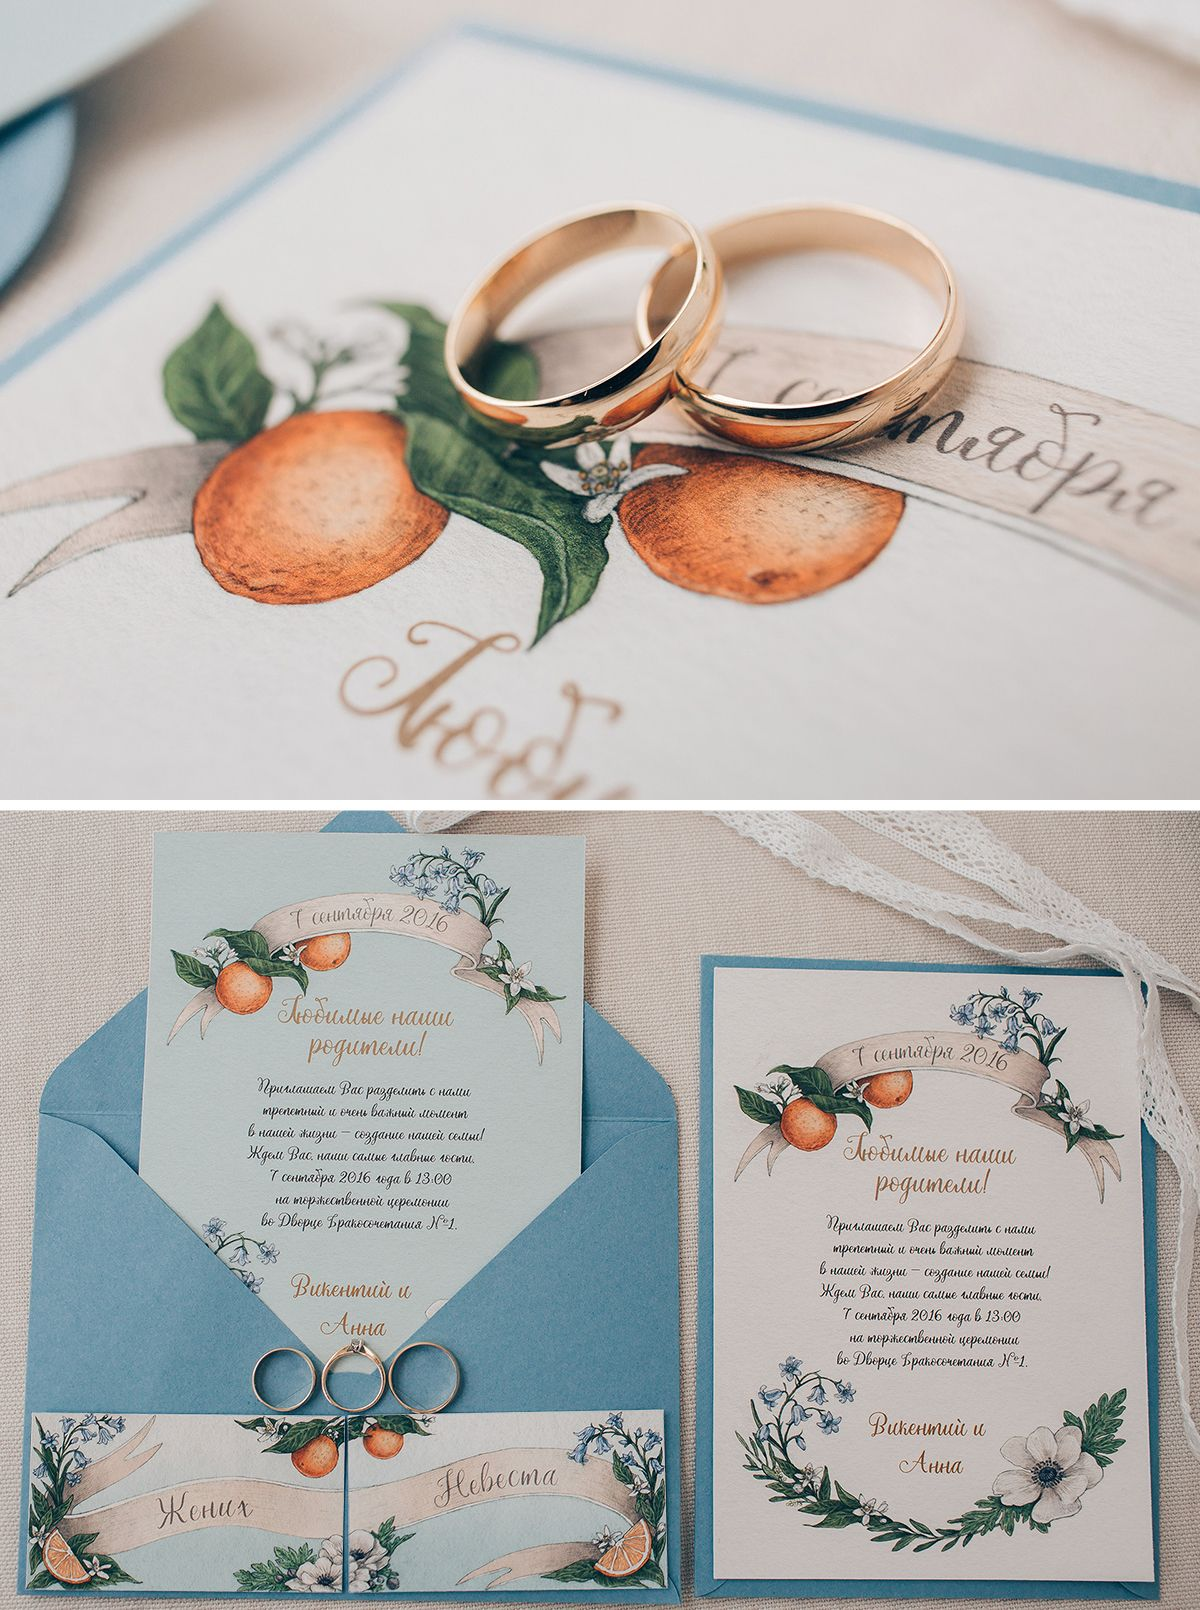 Pin By Lorenzo Positano On Partecipazioni Pinterest Wedding And